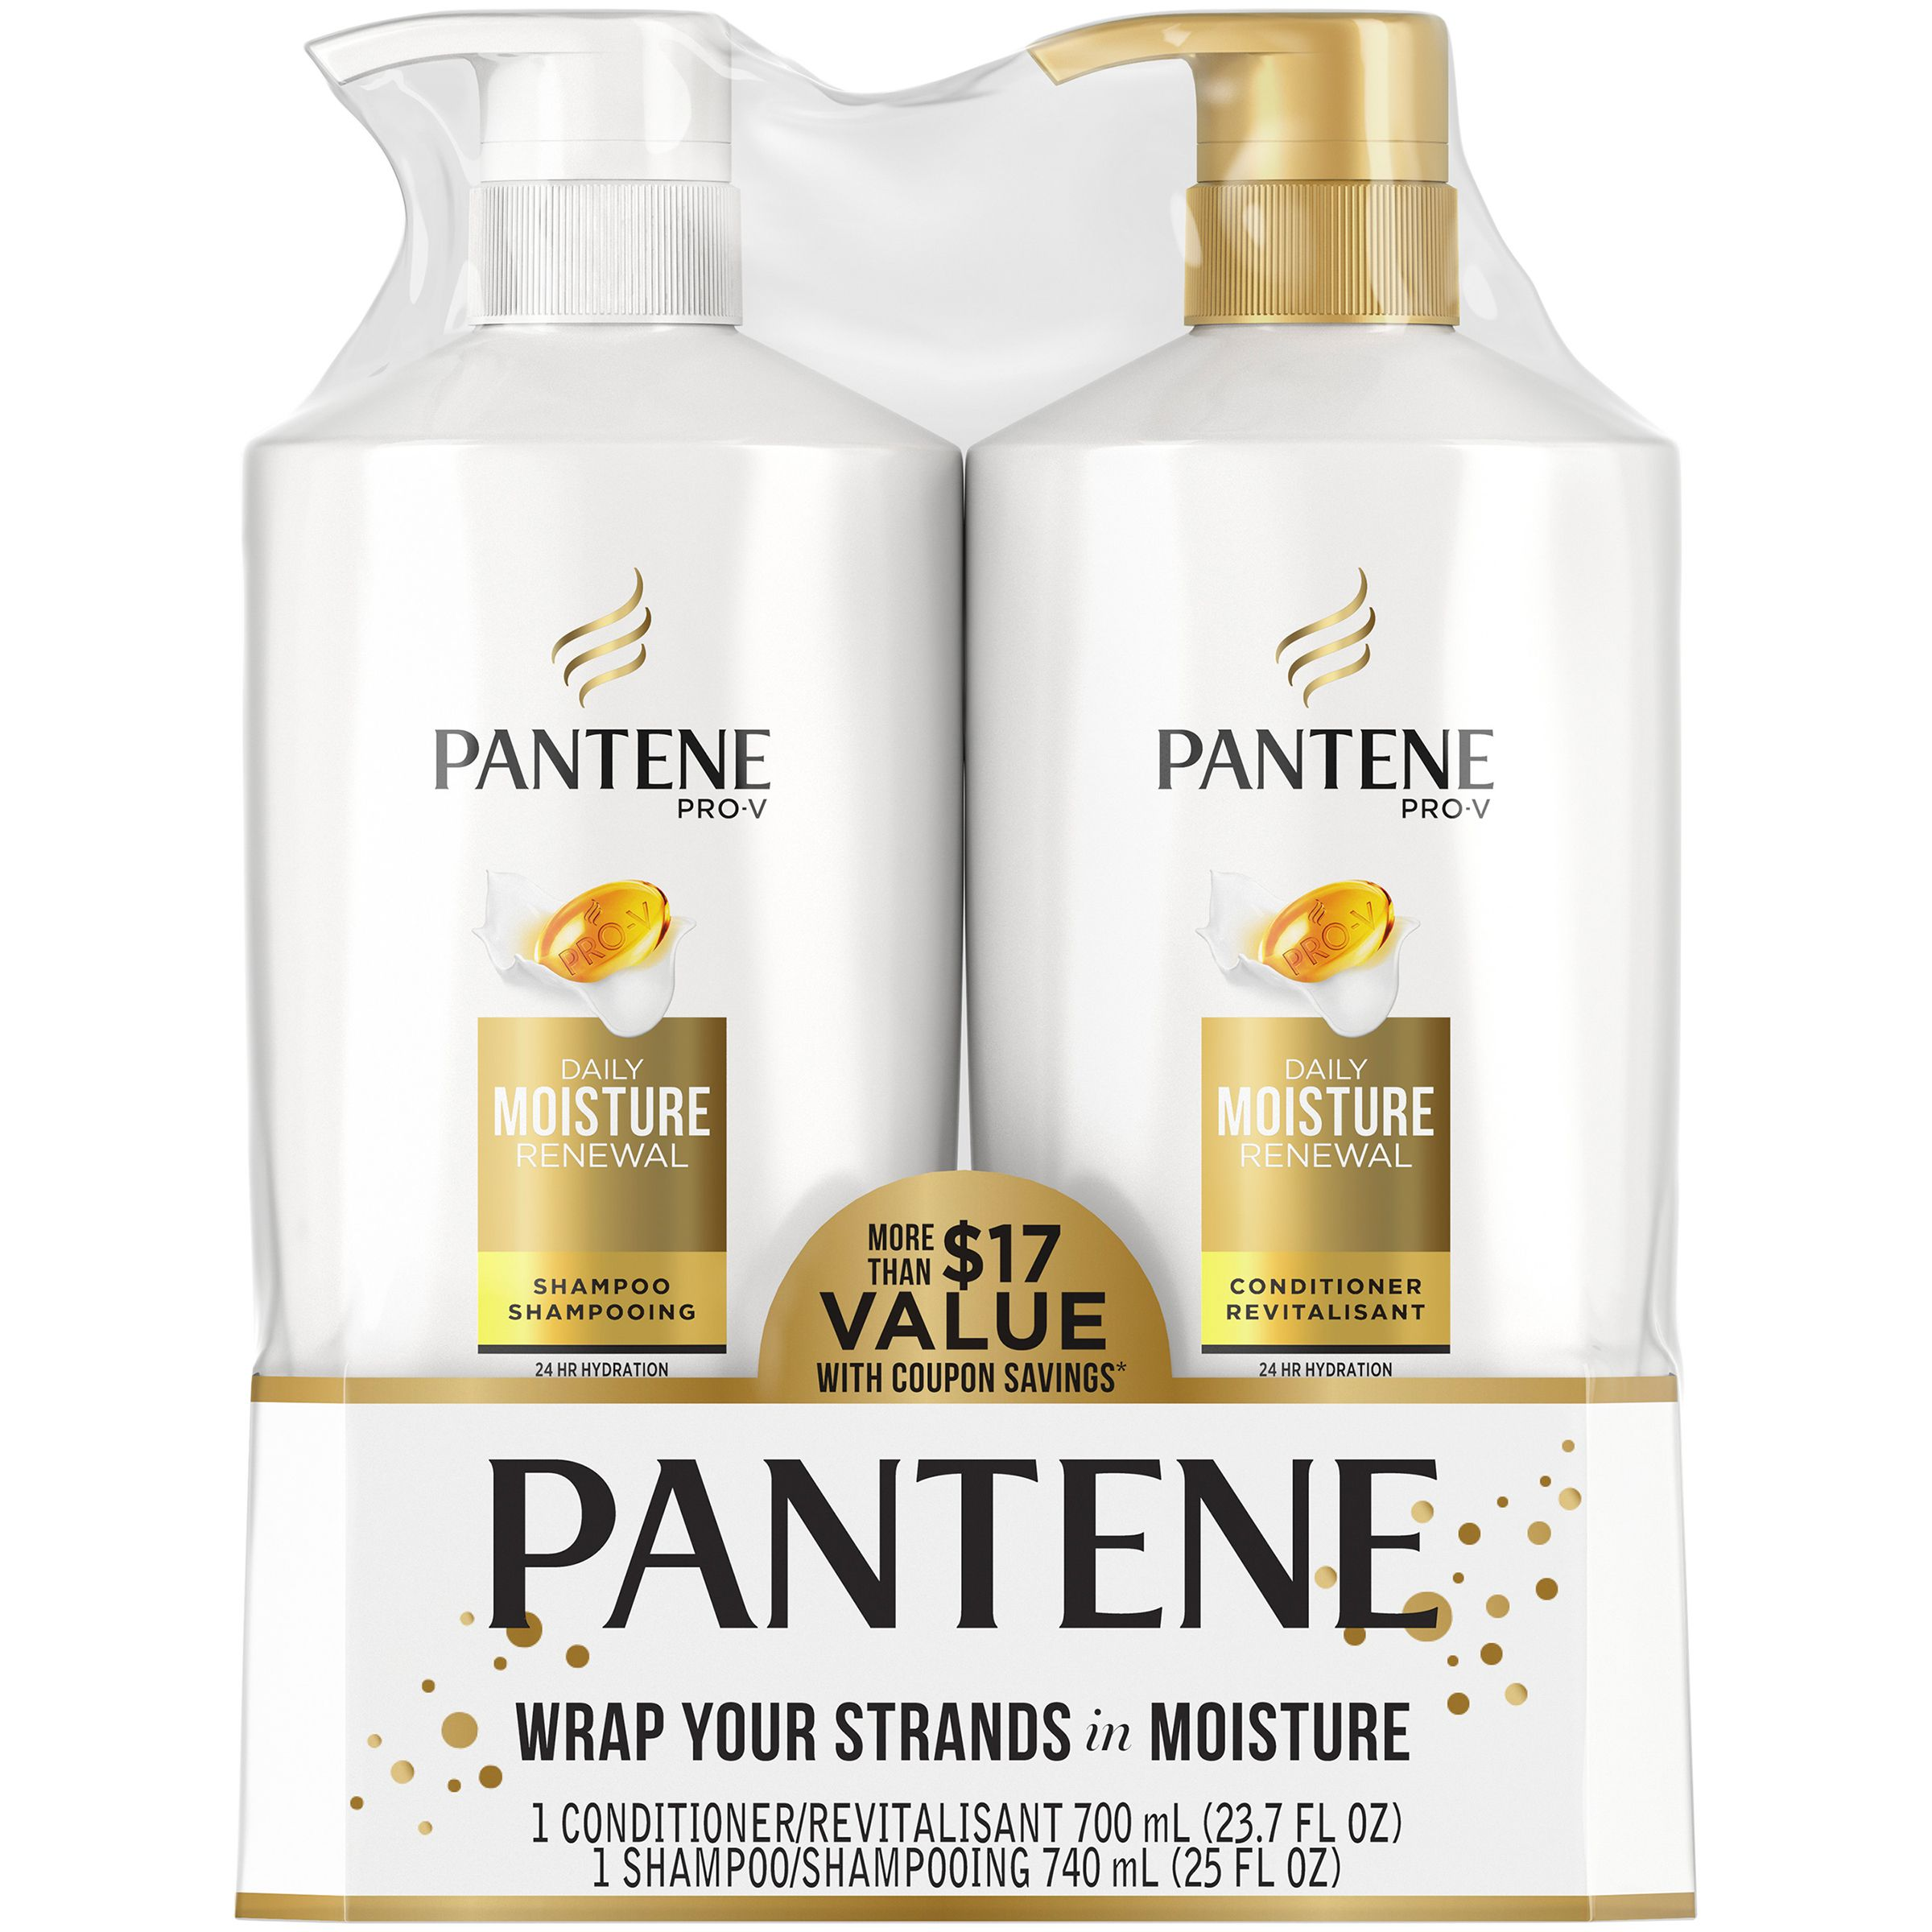 Pantene Pro V Daily Moisture Renewal Shampoo And Conditioner Dual Pack 48 7 Fl Oz 17 Value Walmart Com Shampoo Moisturizer Shampoo And Conditioner